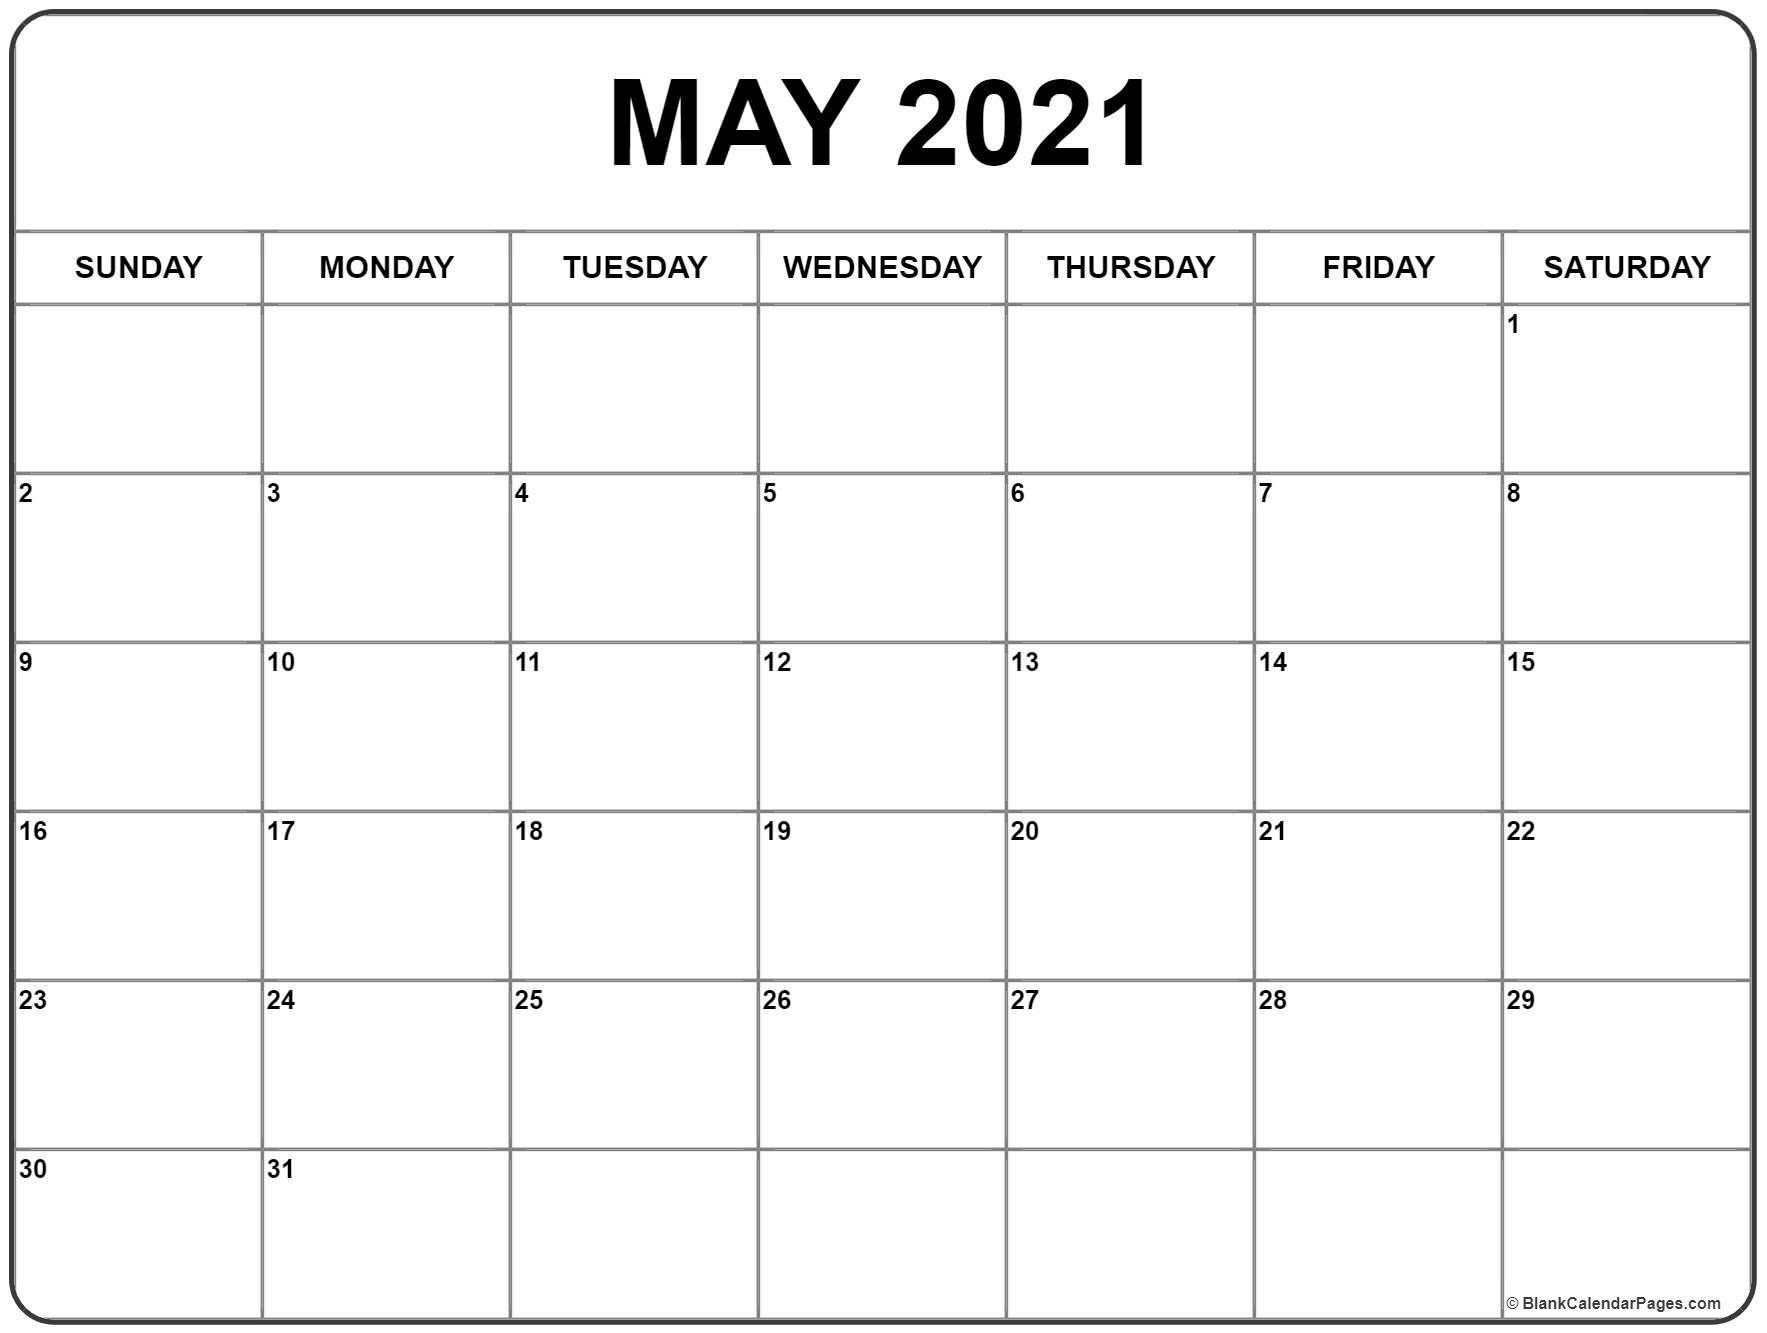 May 2021 Calendar | Free Printable Monthly Calendars